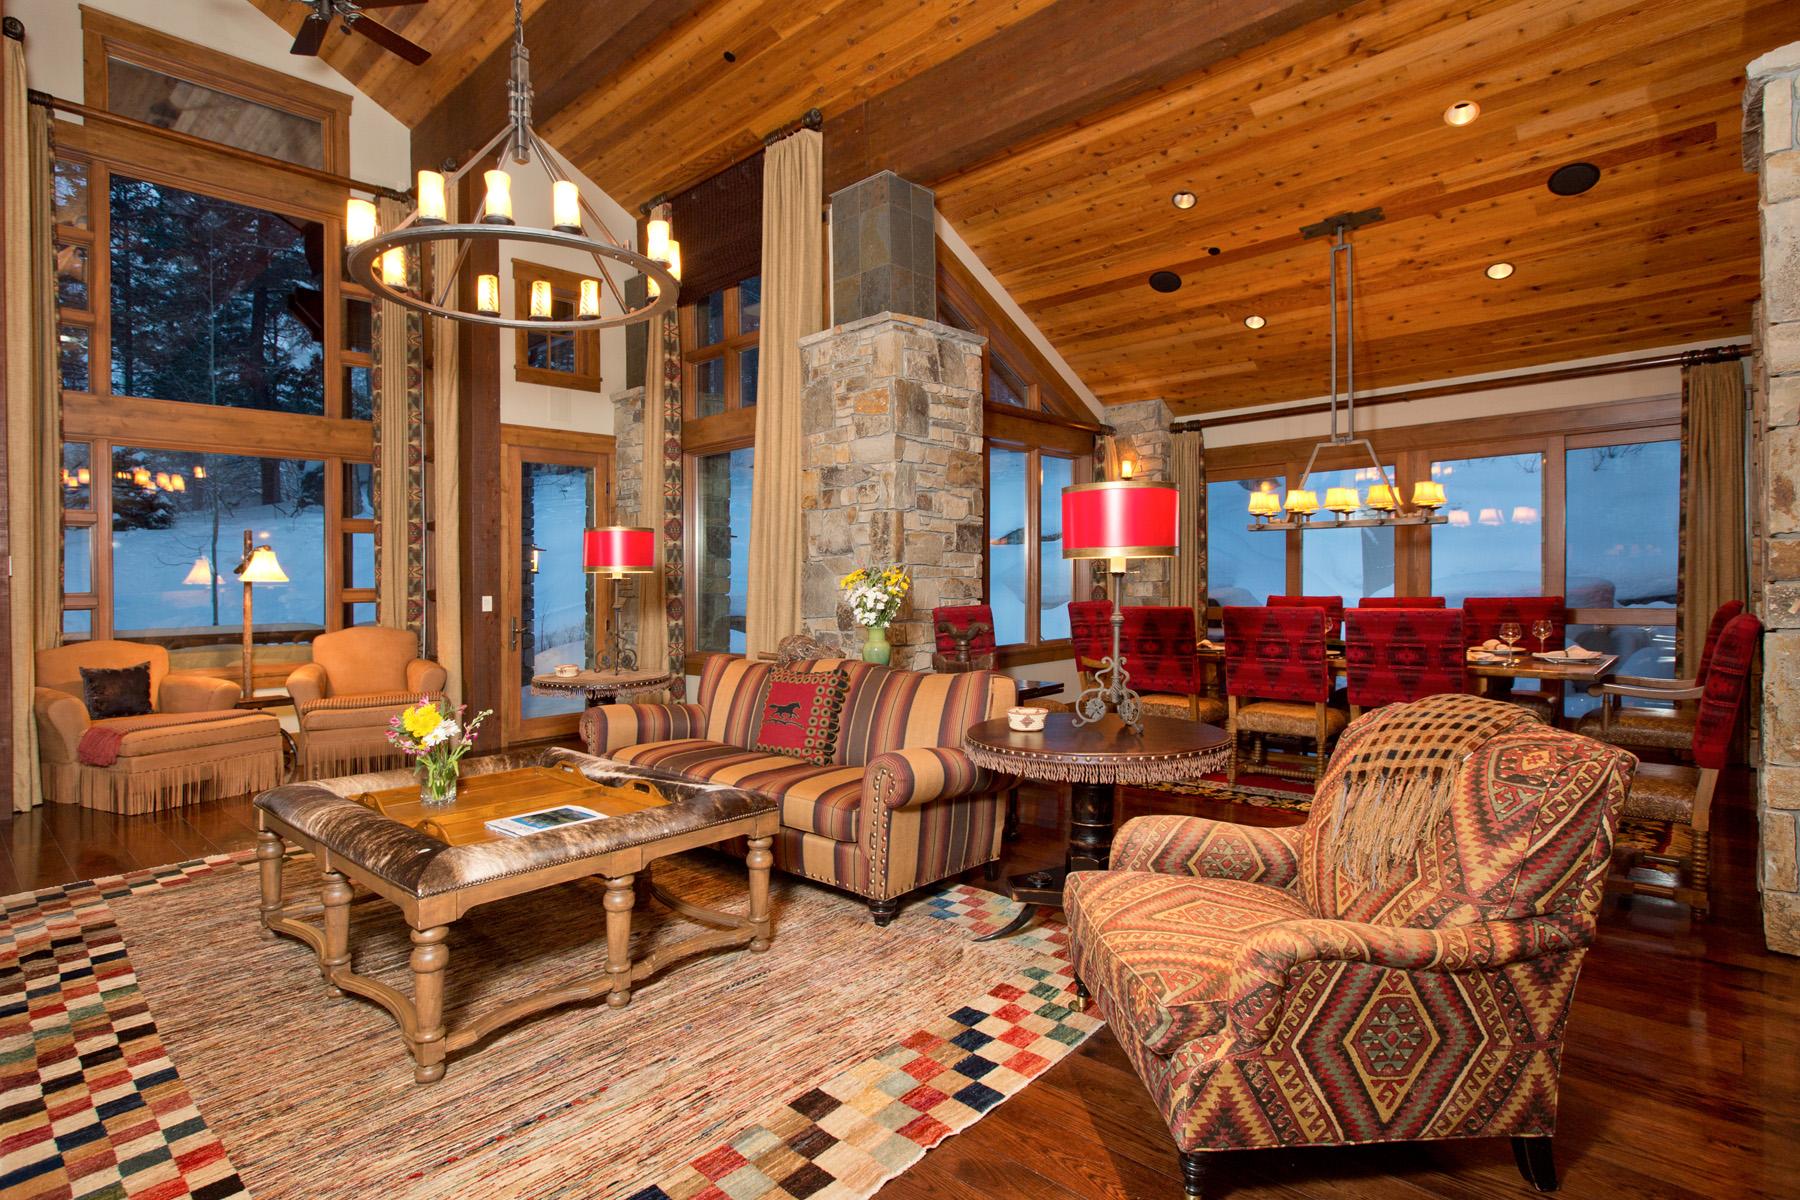 Casa para uma família para Venda às Ski-In Ski-Out Home in Teton Village 3825 W McCollister Drive Teton Village, Wyoming 83025 Estados Unidos